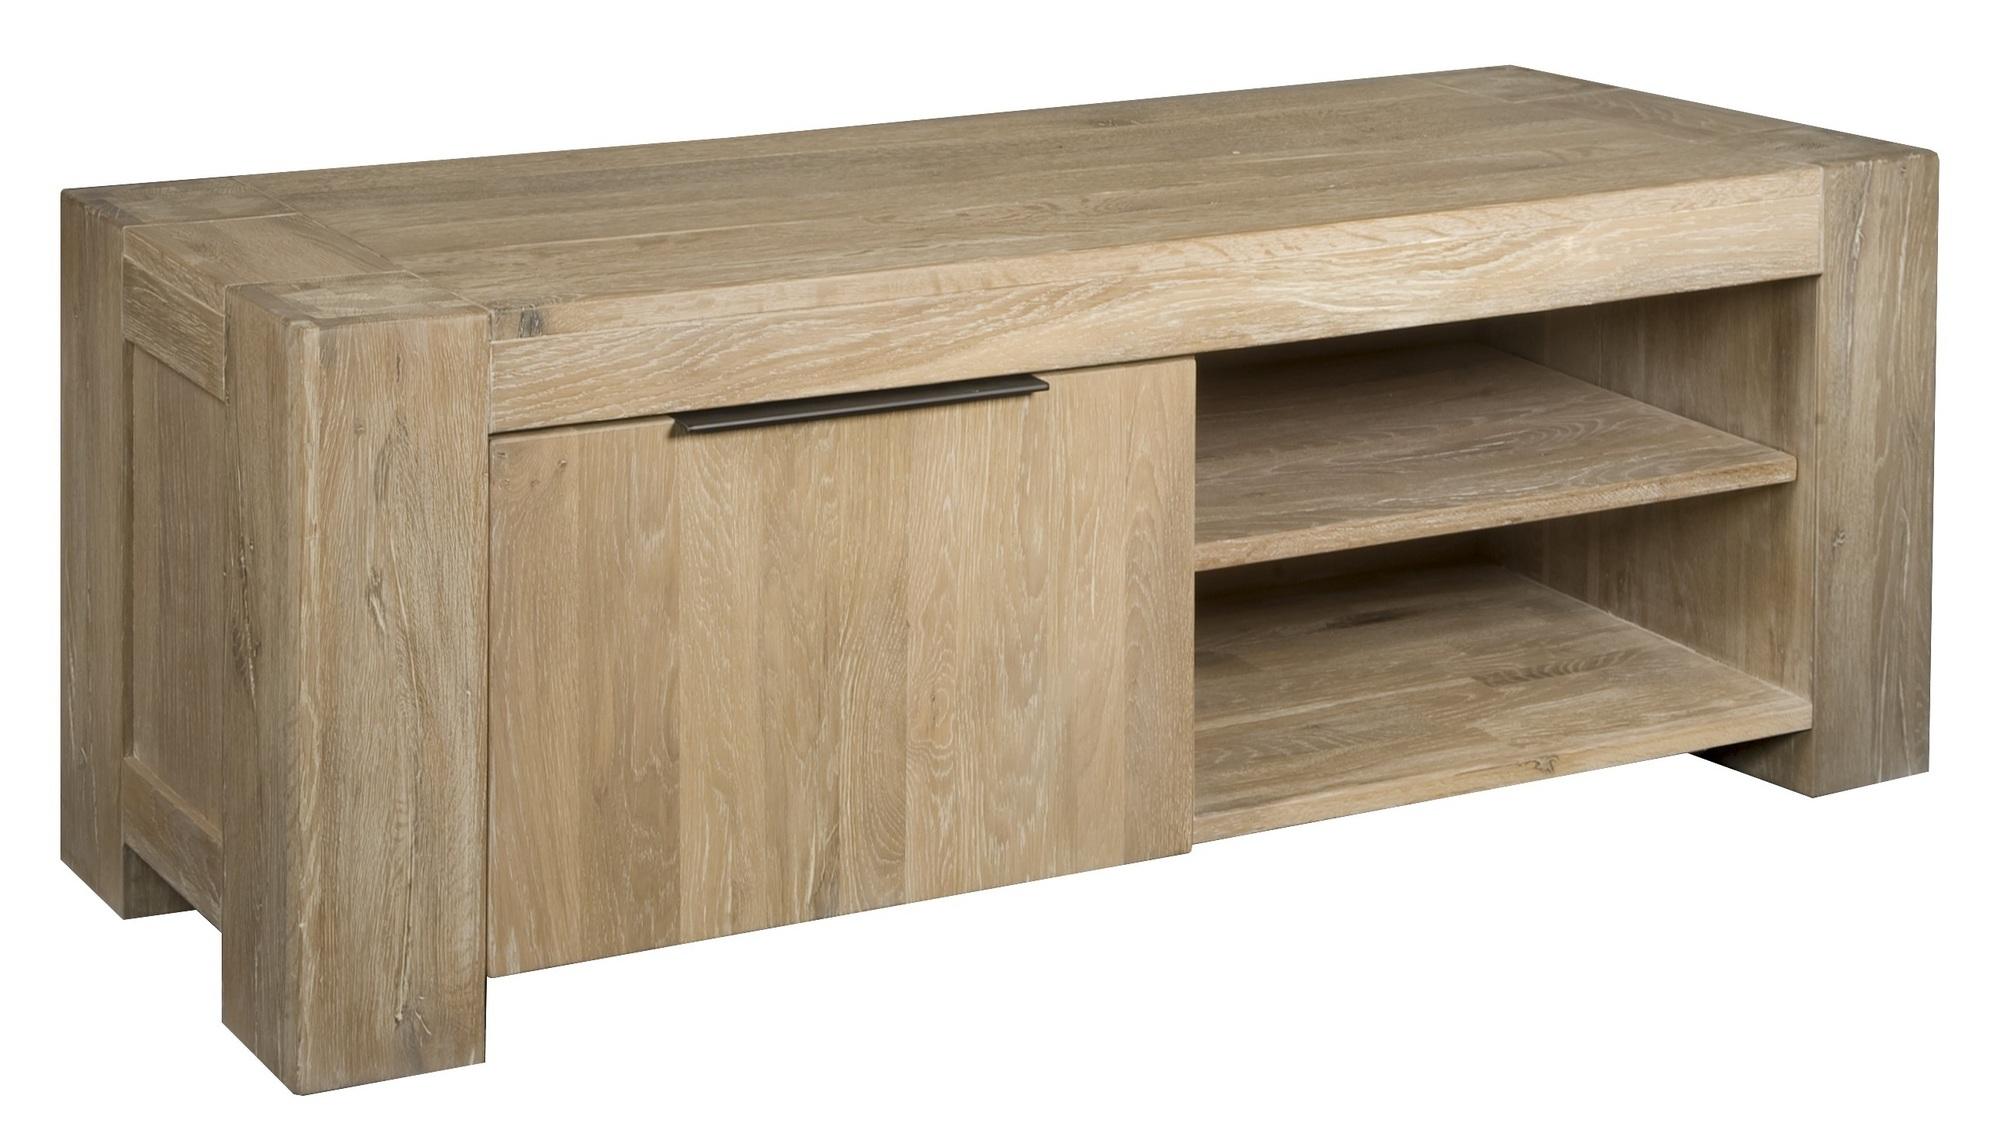 kast-luuk-tv dressoir-towerliving-BM 1009-145cm-eiken-whitewash-deurtje-planken